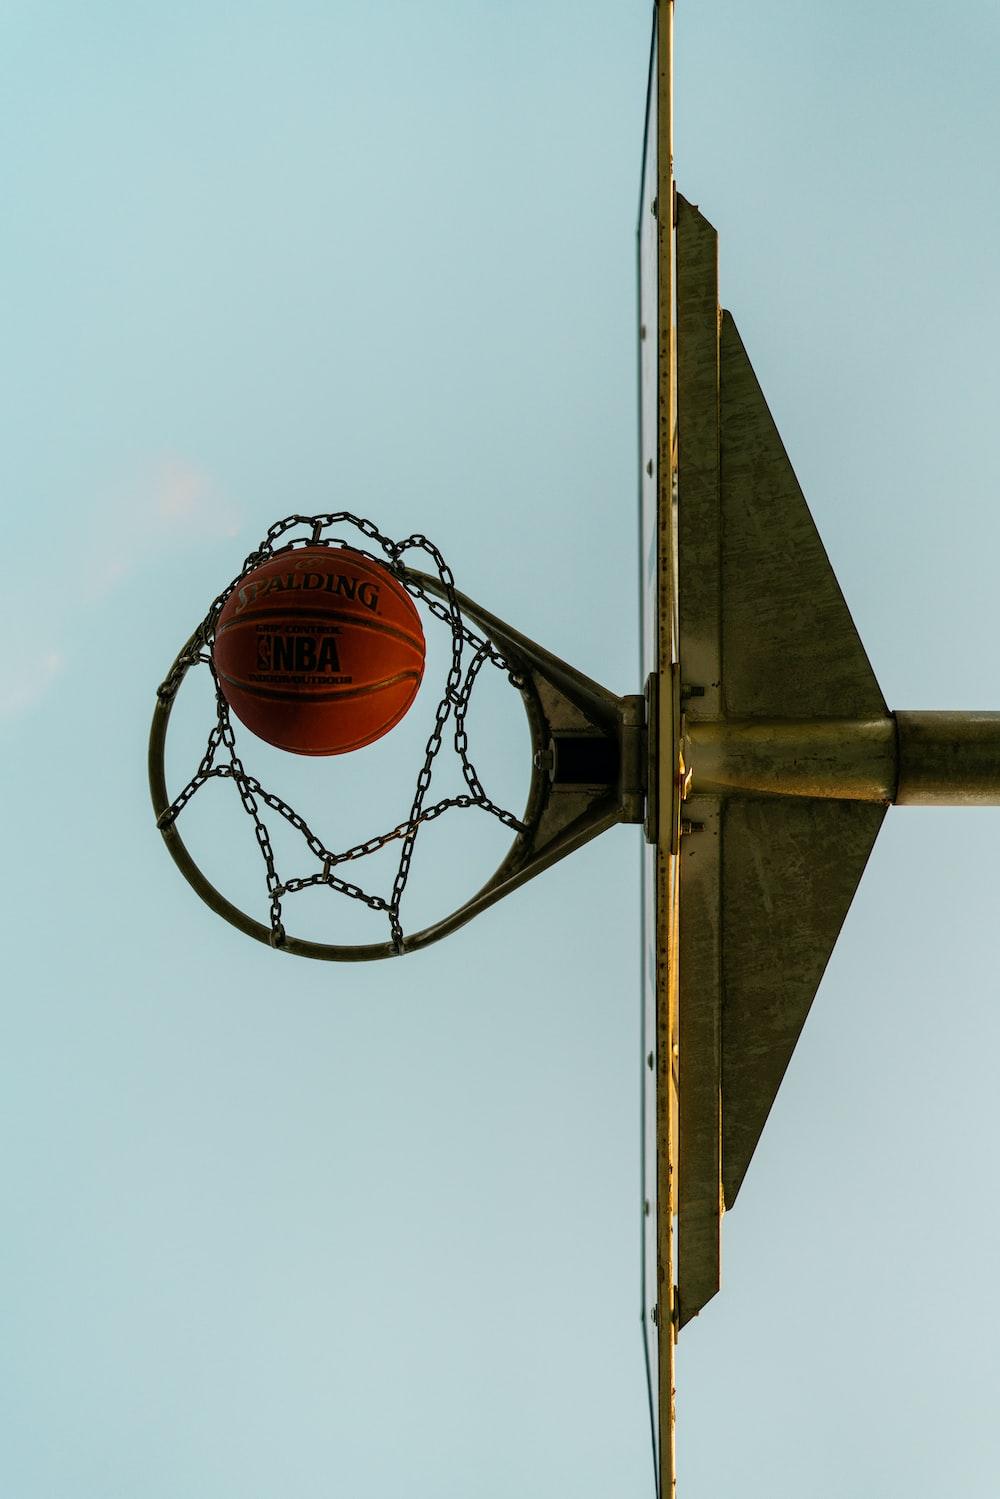 basketball on basketball hoop under blue sky during daytime